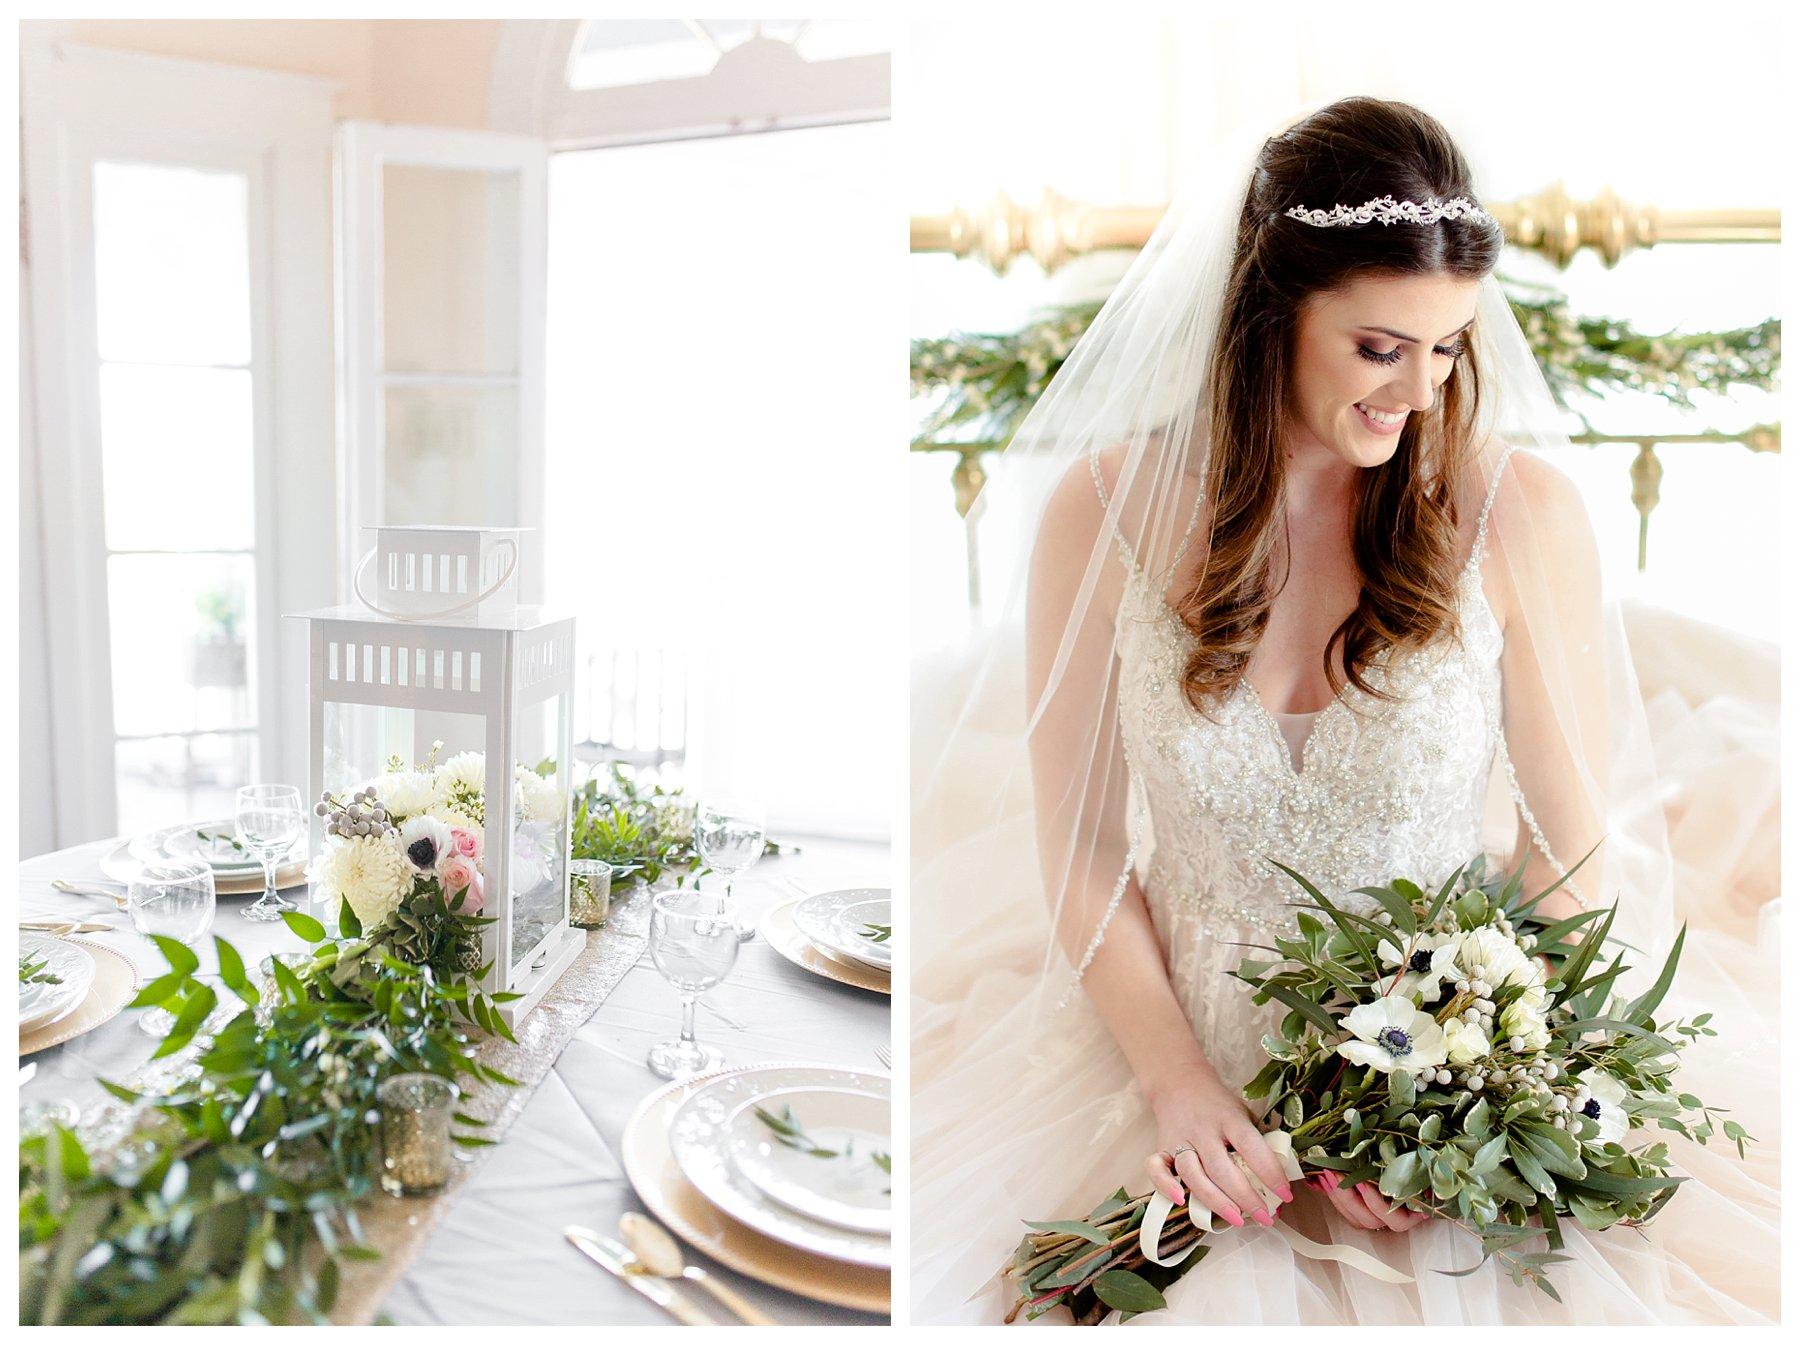 photographer_wedding_saint_louis_Kansas_City_Photography_Videography_workshop_training_styled_engagement_Lake_Ozark_KC_MO_STL_Rolla_Hermann_Saint_James_0393.jpg